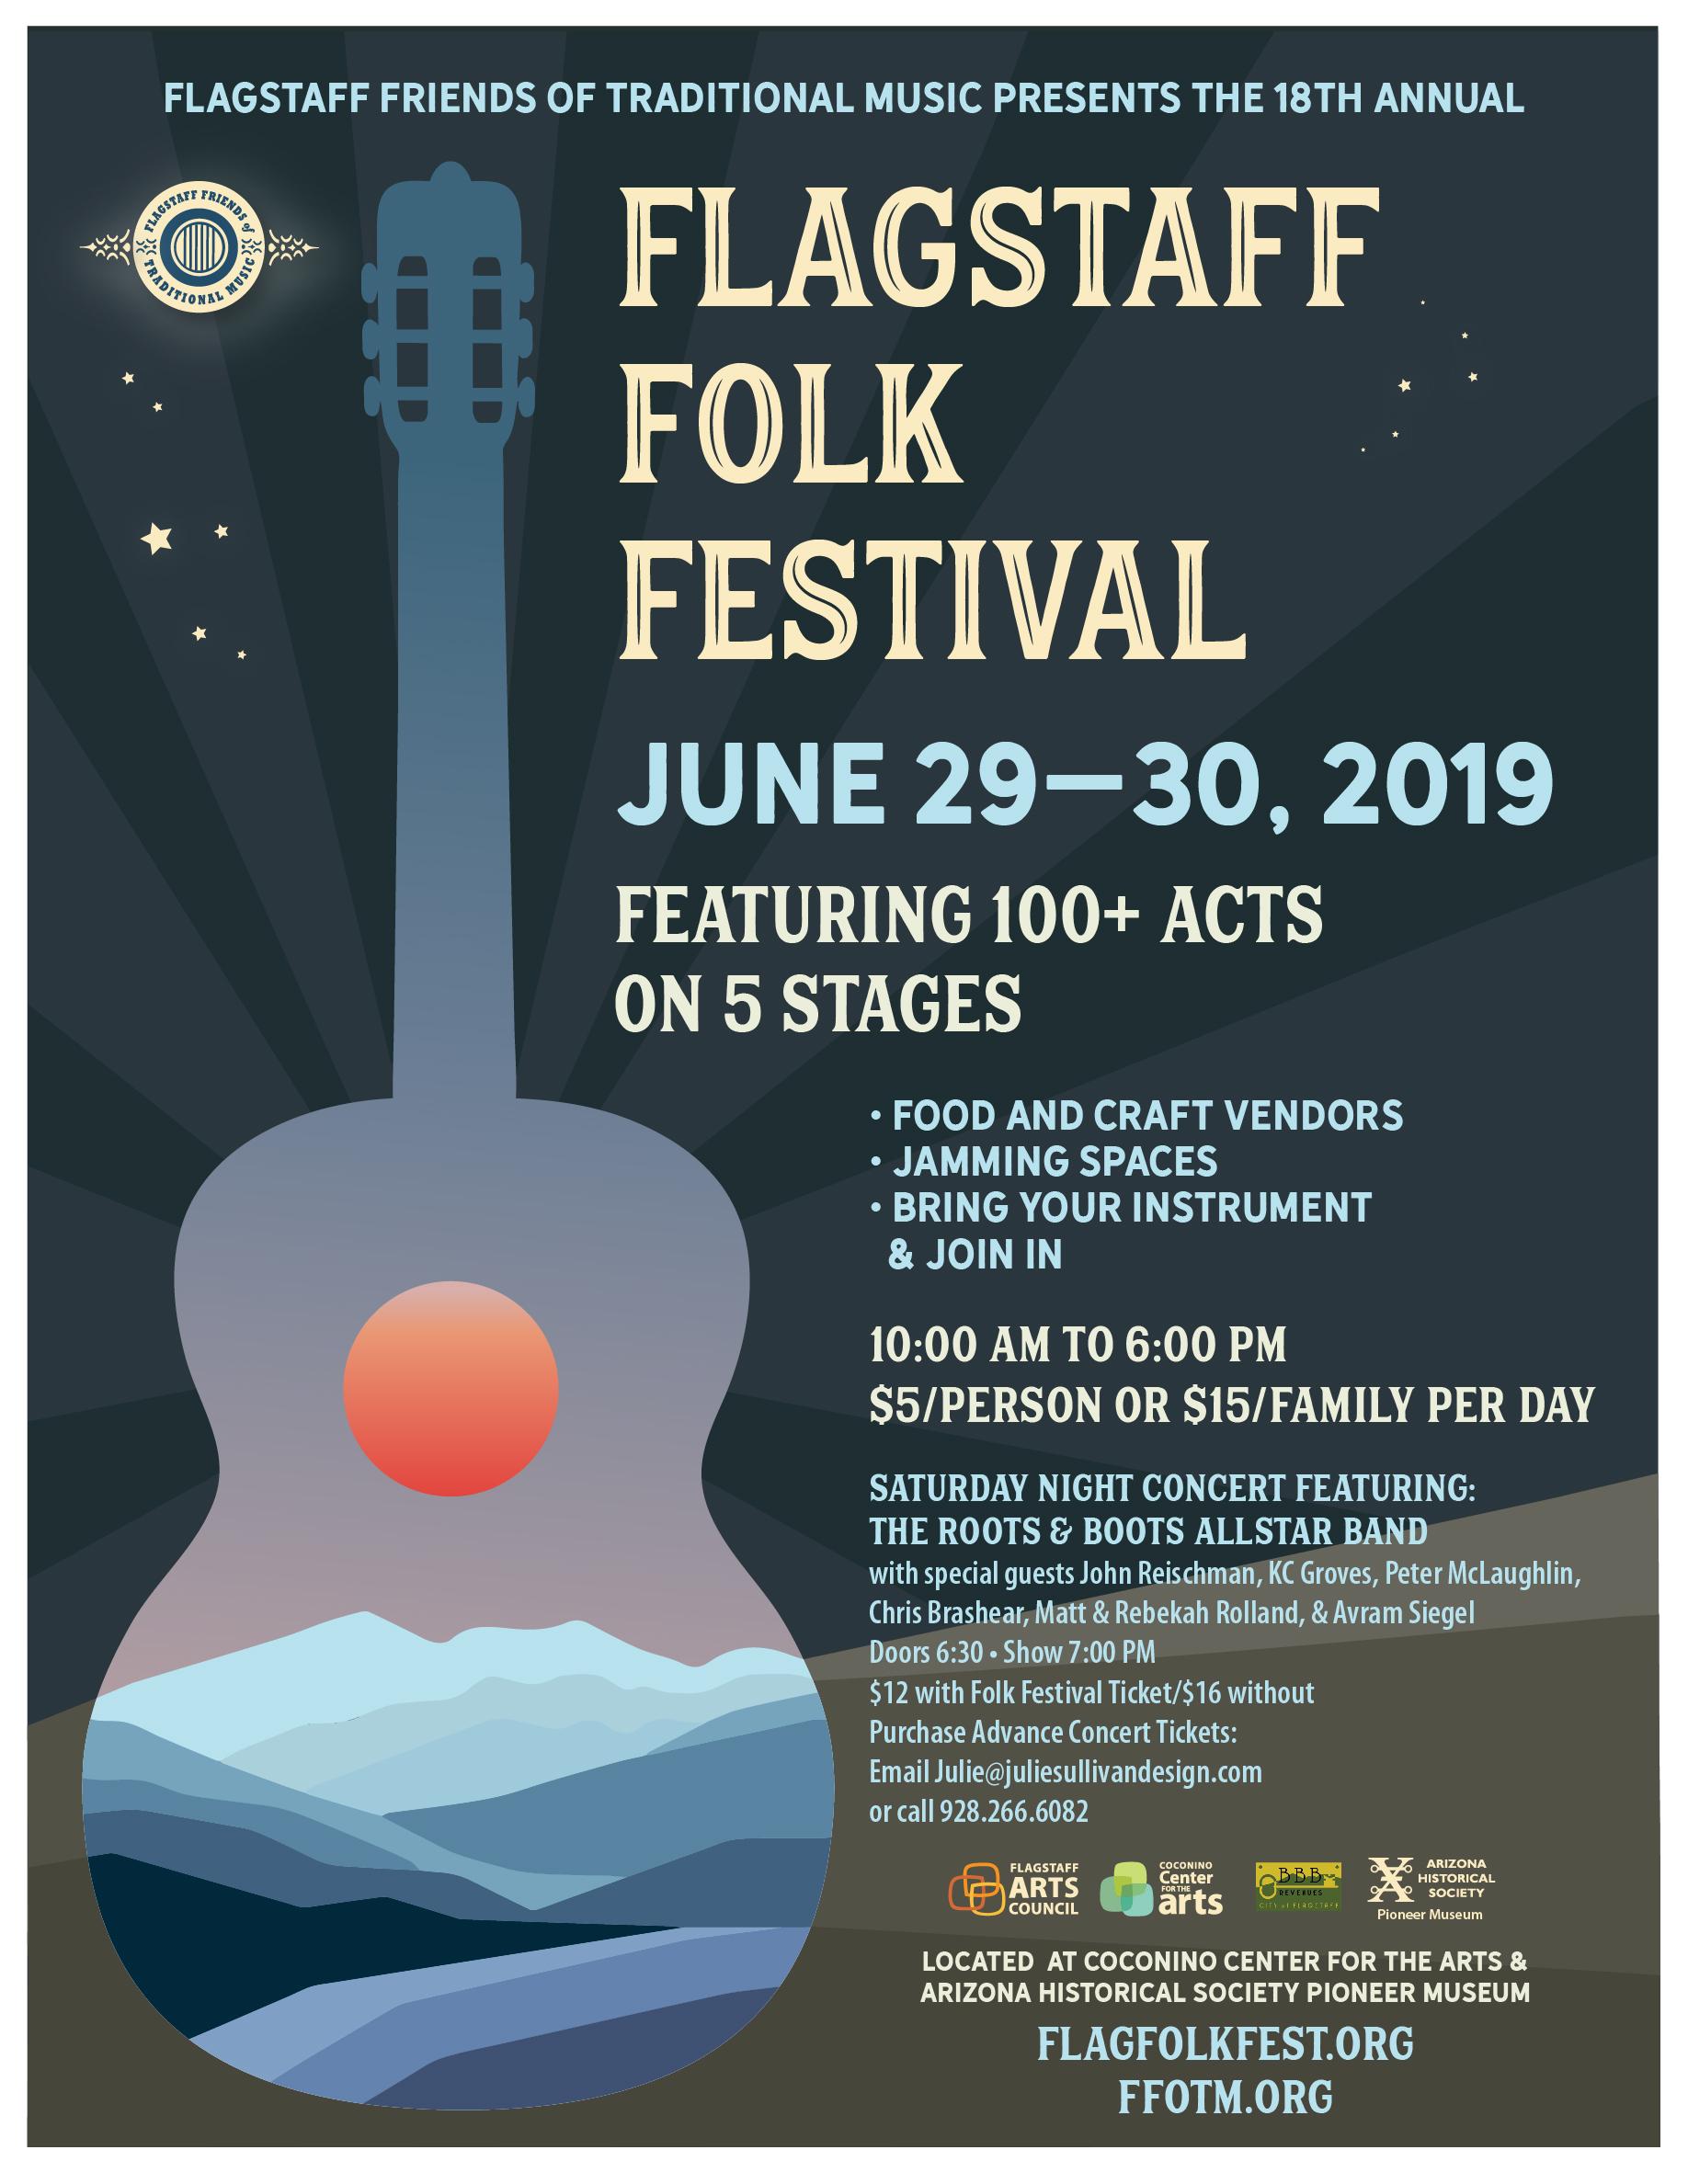 Flagstaff Folk Festival 2019 Poster